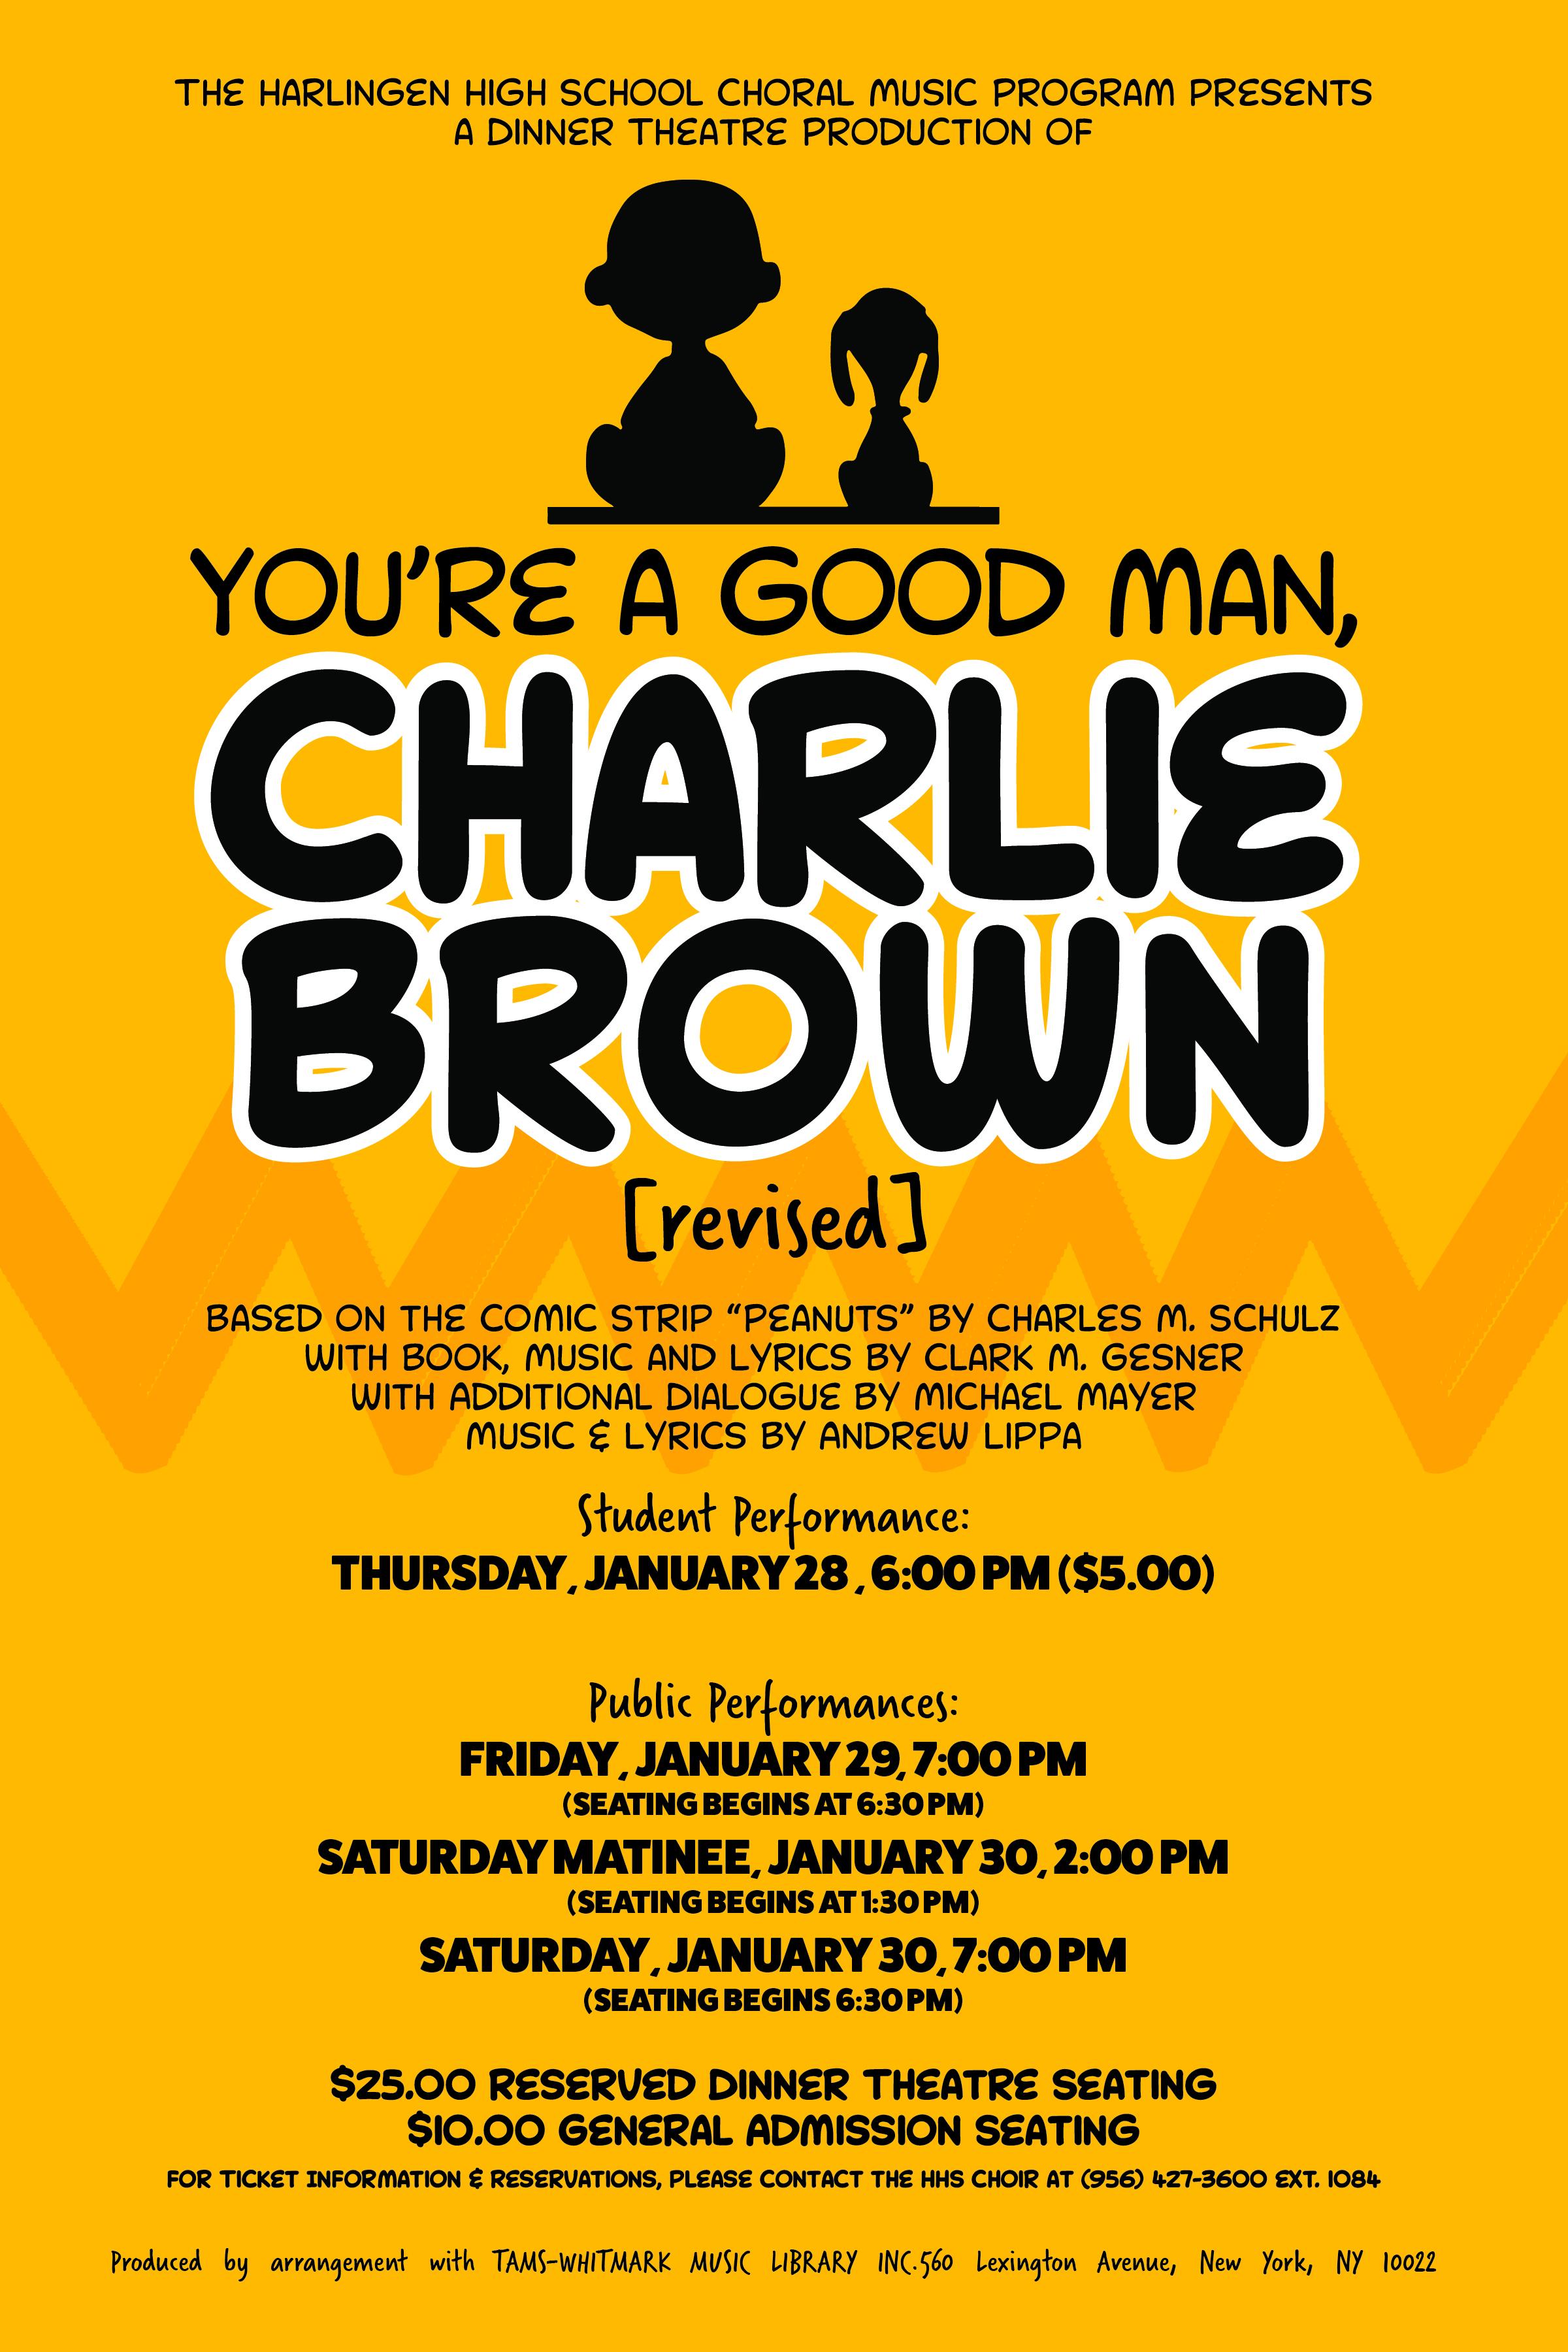 HHS choir presents You're a Good Man, Charlie Brown